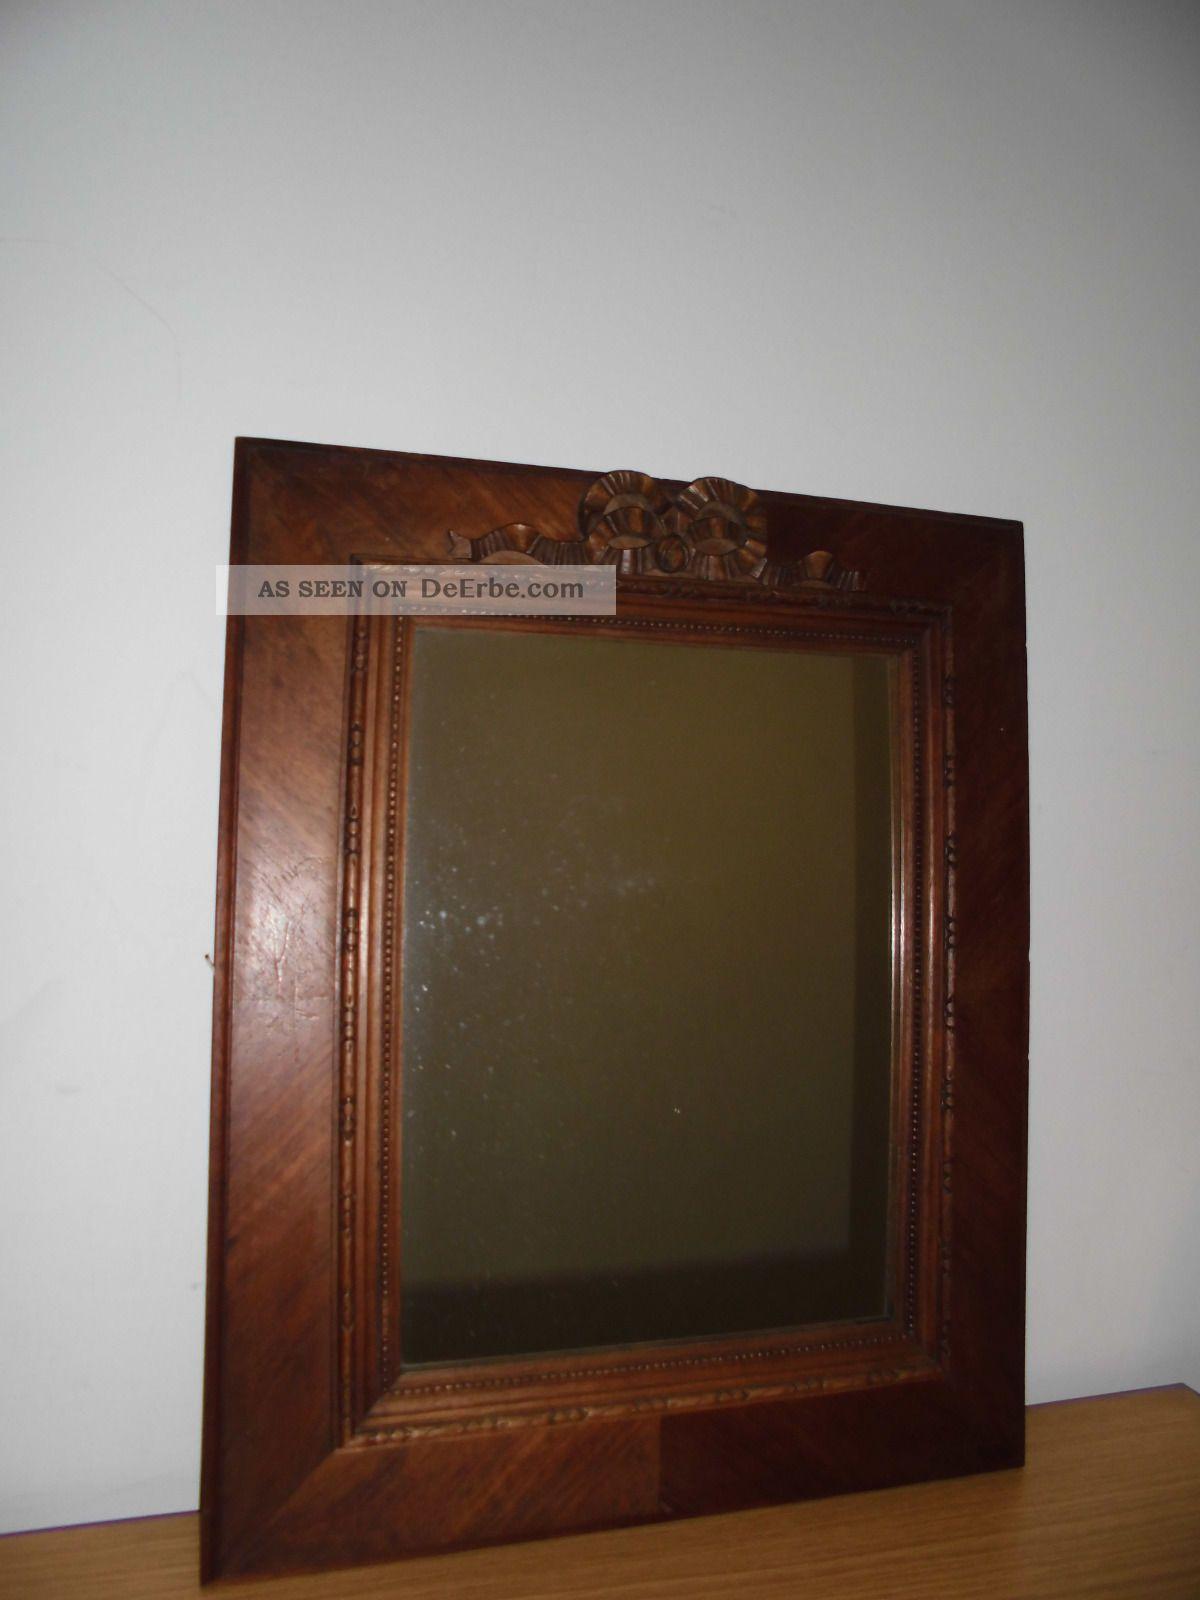 Mobiliar & Interieur - Spiegel & Rahmen - Spiegel - Antike Originale ...